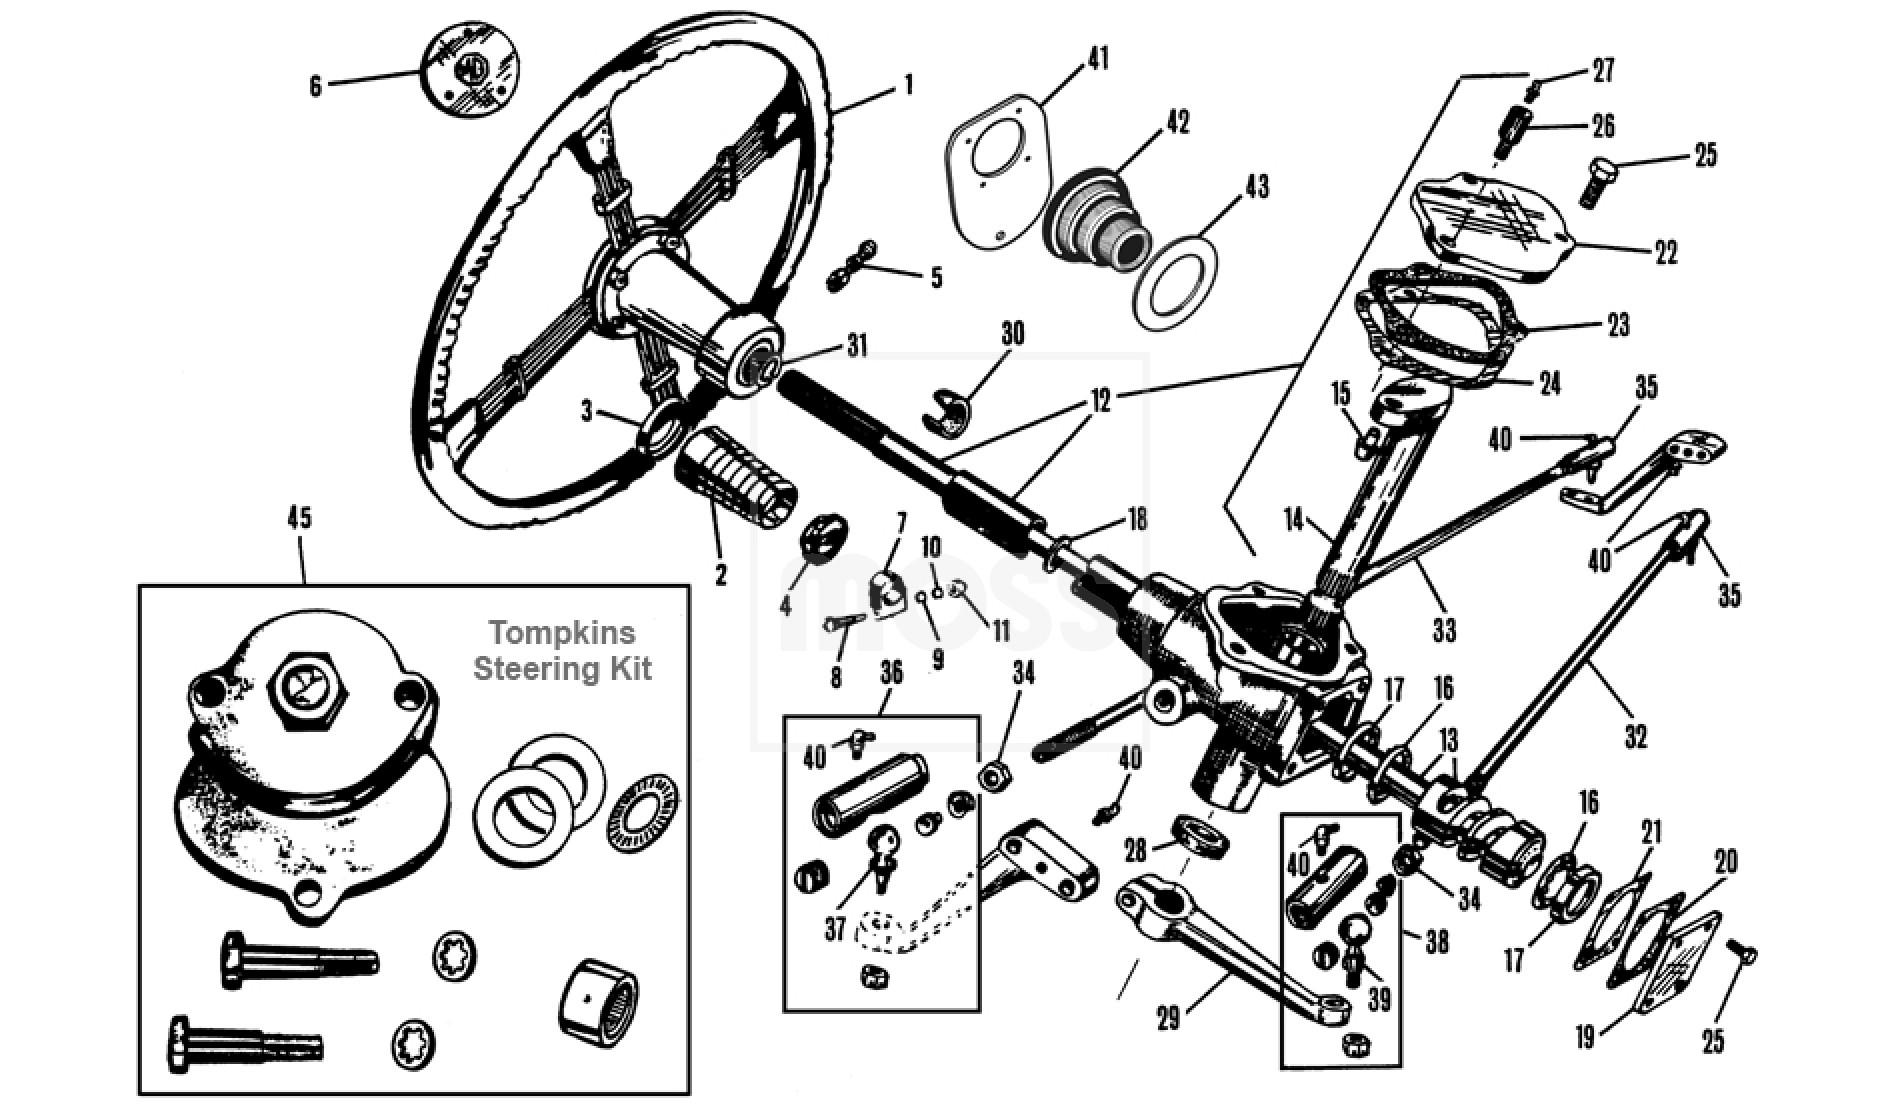 1974 mg midget wiring diagram corsa c cd player mgb fuse box